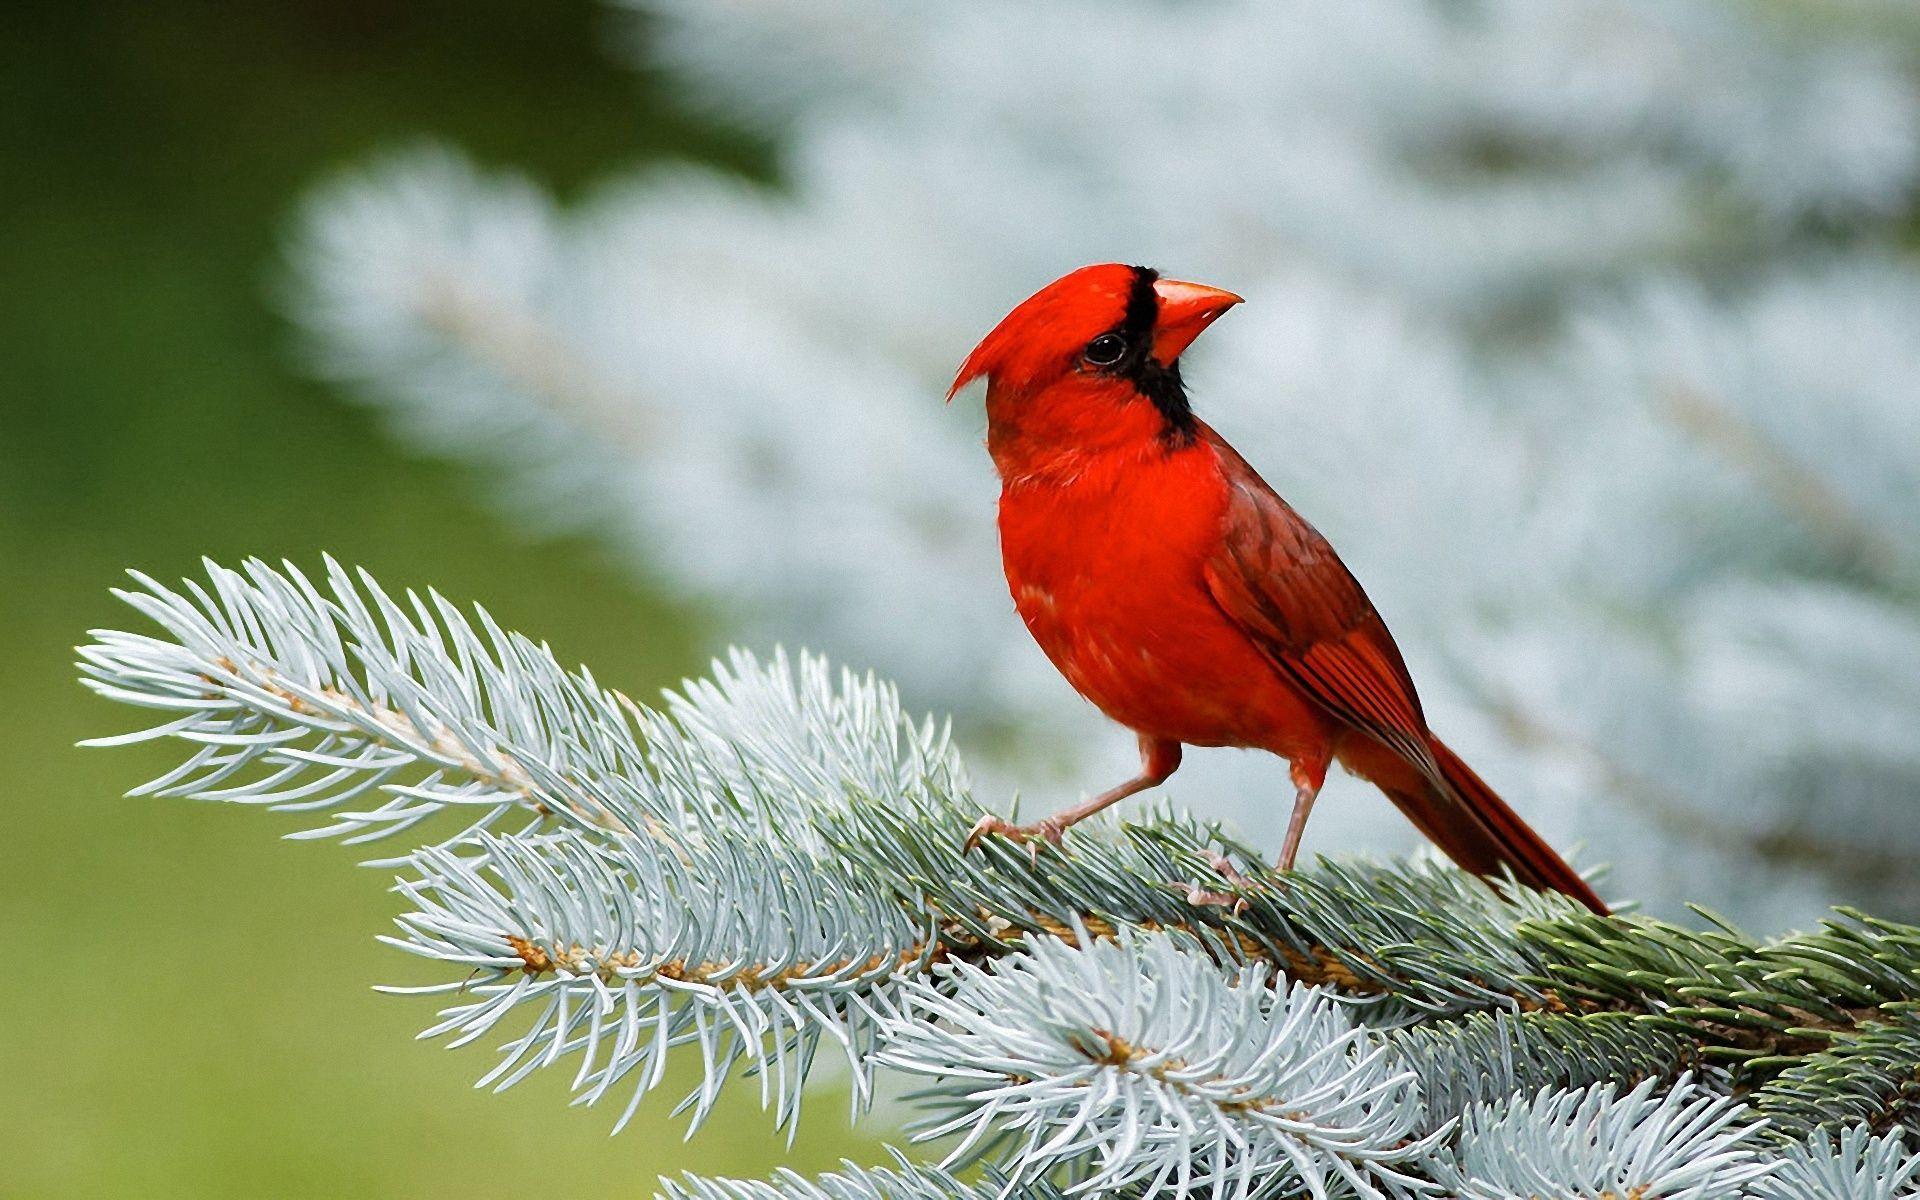 Park Art My WordPress Blog_Red Birds In A Tree Scrophularia Macrantha